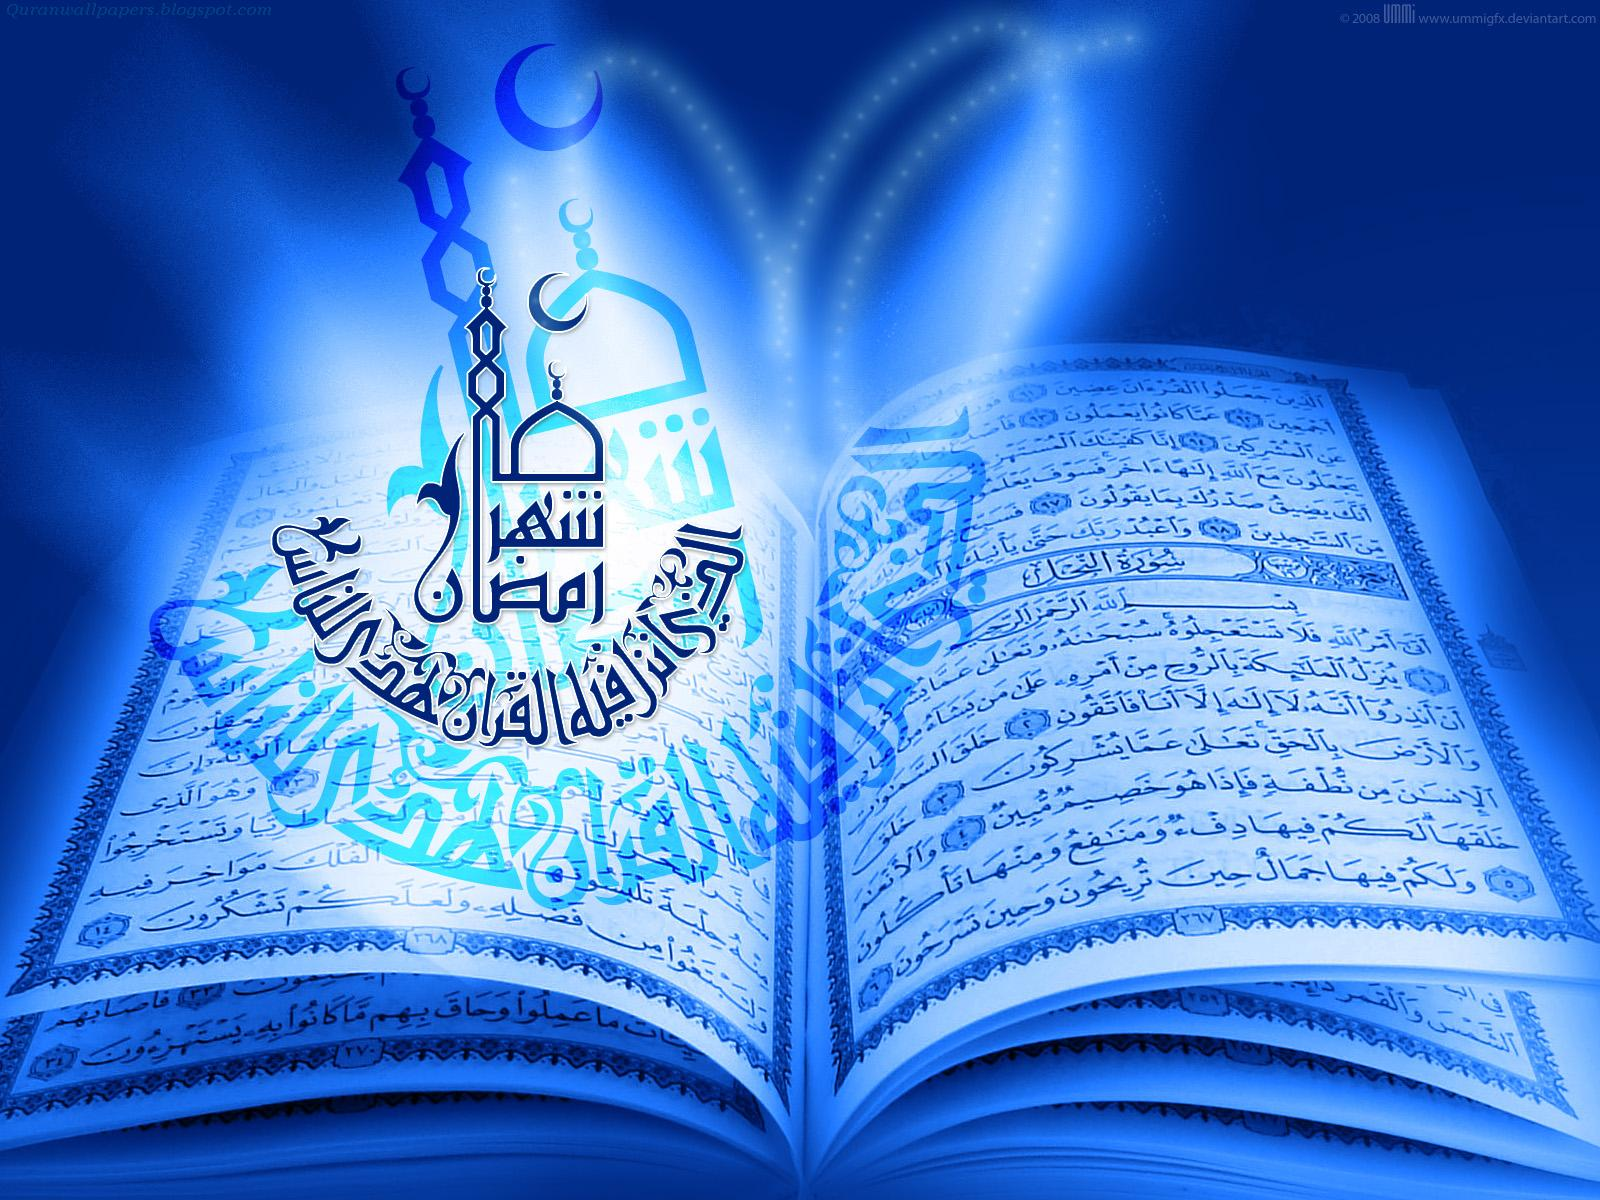 http://4.bp.blogspot.com/-q9shygkSL1s/UAn8XMQfAaI/AAAAAAAAAHw/1Bu1WCiKtug/s1600/Salaam_Ramadan_ISLAM_QURAN_WALLPAPERS_2011.jpg